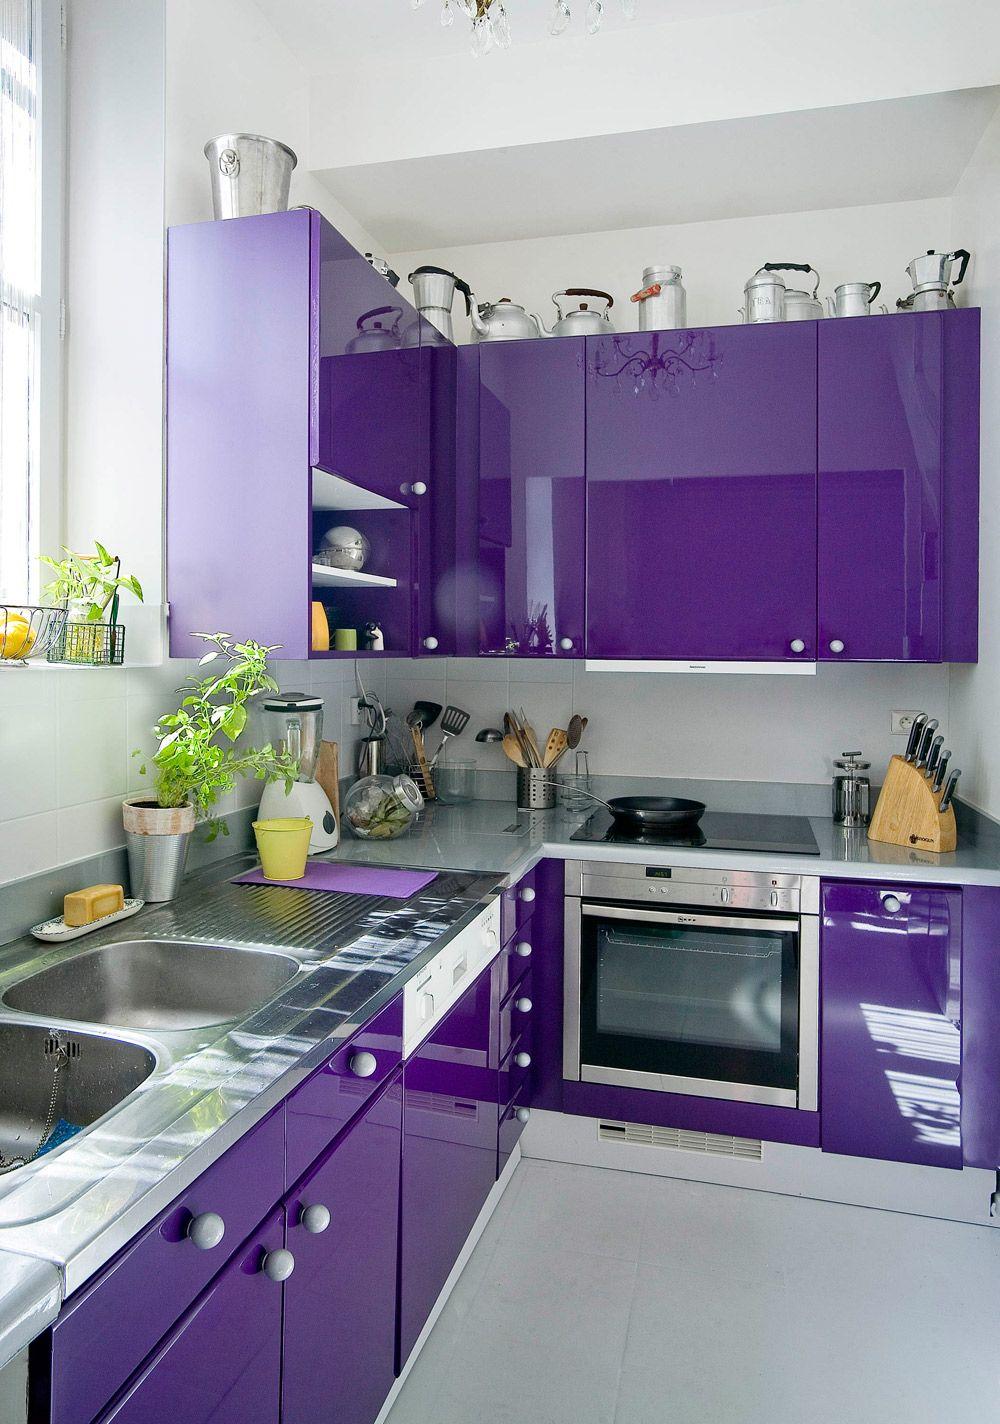 id es de relooking transformation de meubles avant apr s d caper un meuble m tal violets. Black Bedroom Furniture Sets. Home Design Ideas